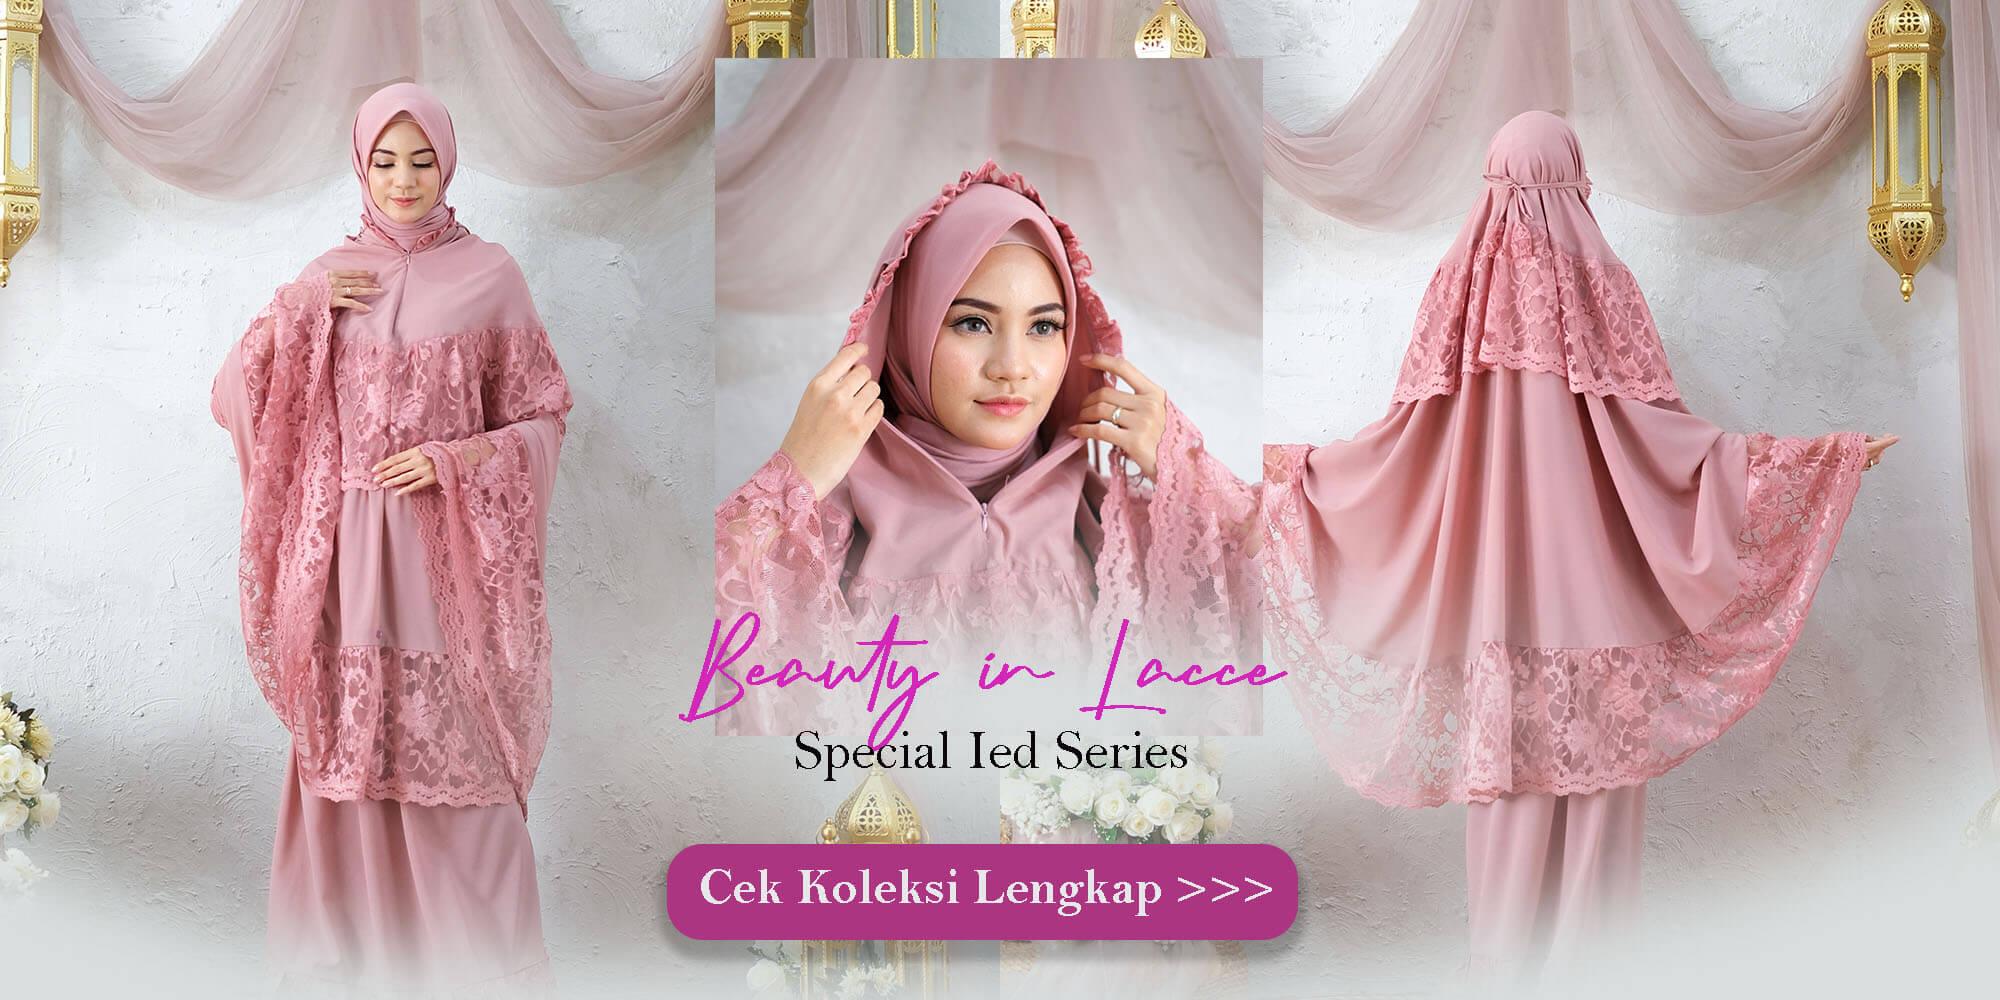 Kunci : Hati-Hati, 5 Perbuatan yang Bisa Mengurangi Pahala Puasa Ramadhan - Amalan Bulan Ramadhan - Model Baju Muslim Lebaran 2021 - Baju Gamis Renda